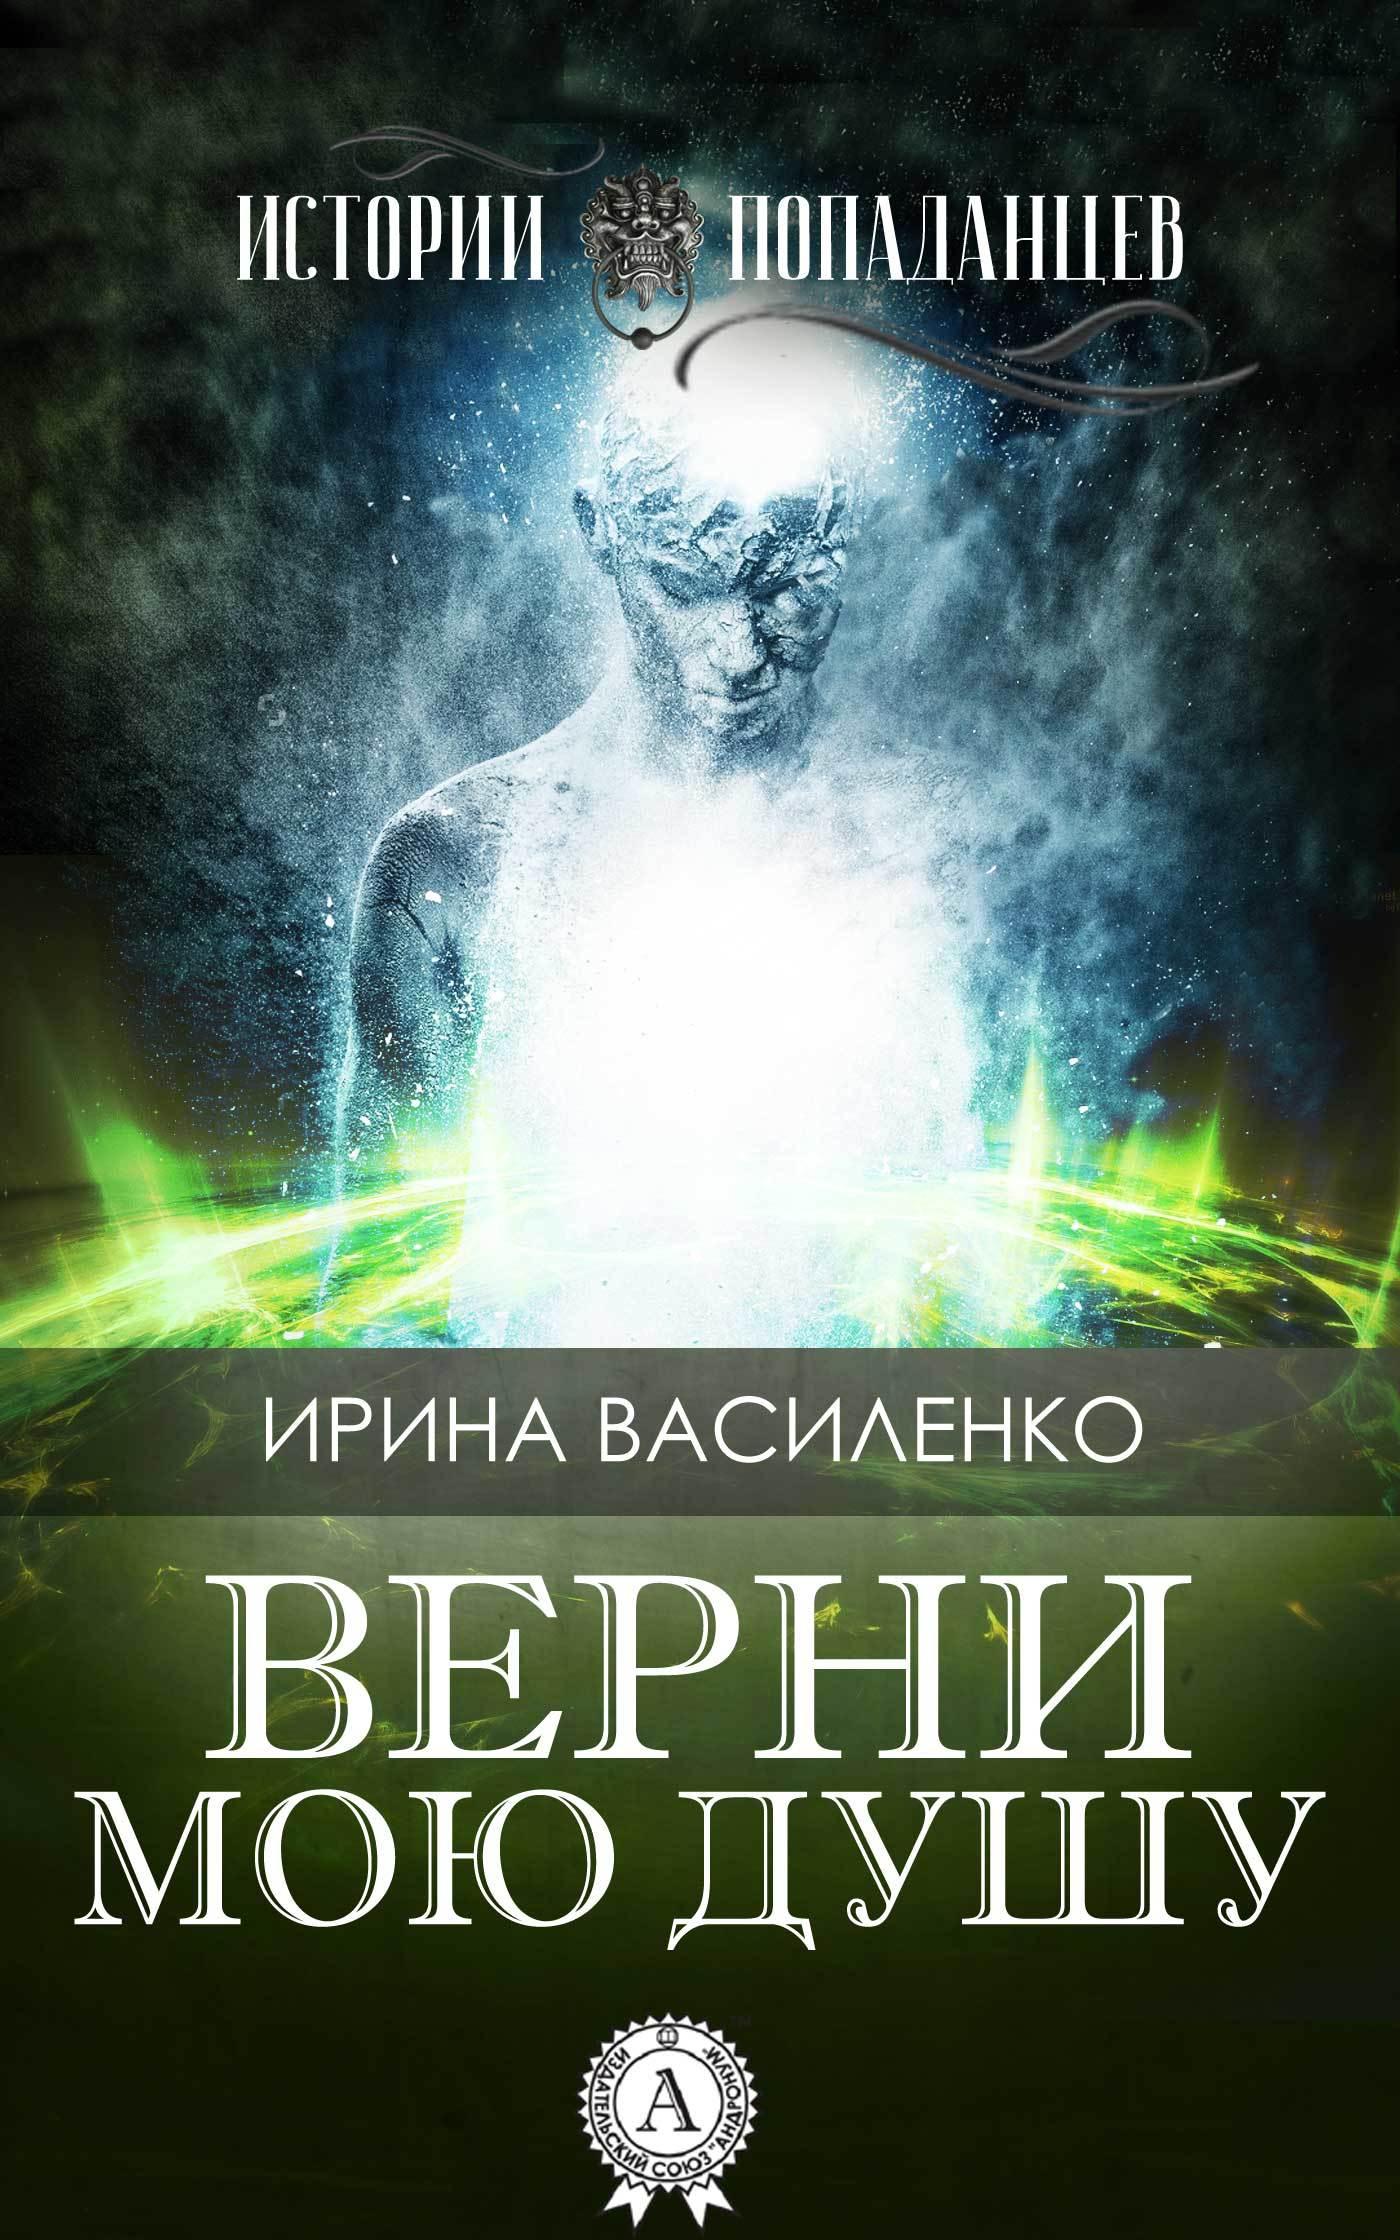 Ирина Василенко бесплатно